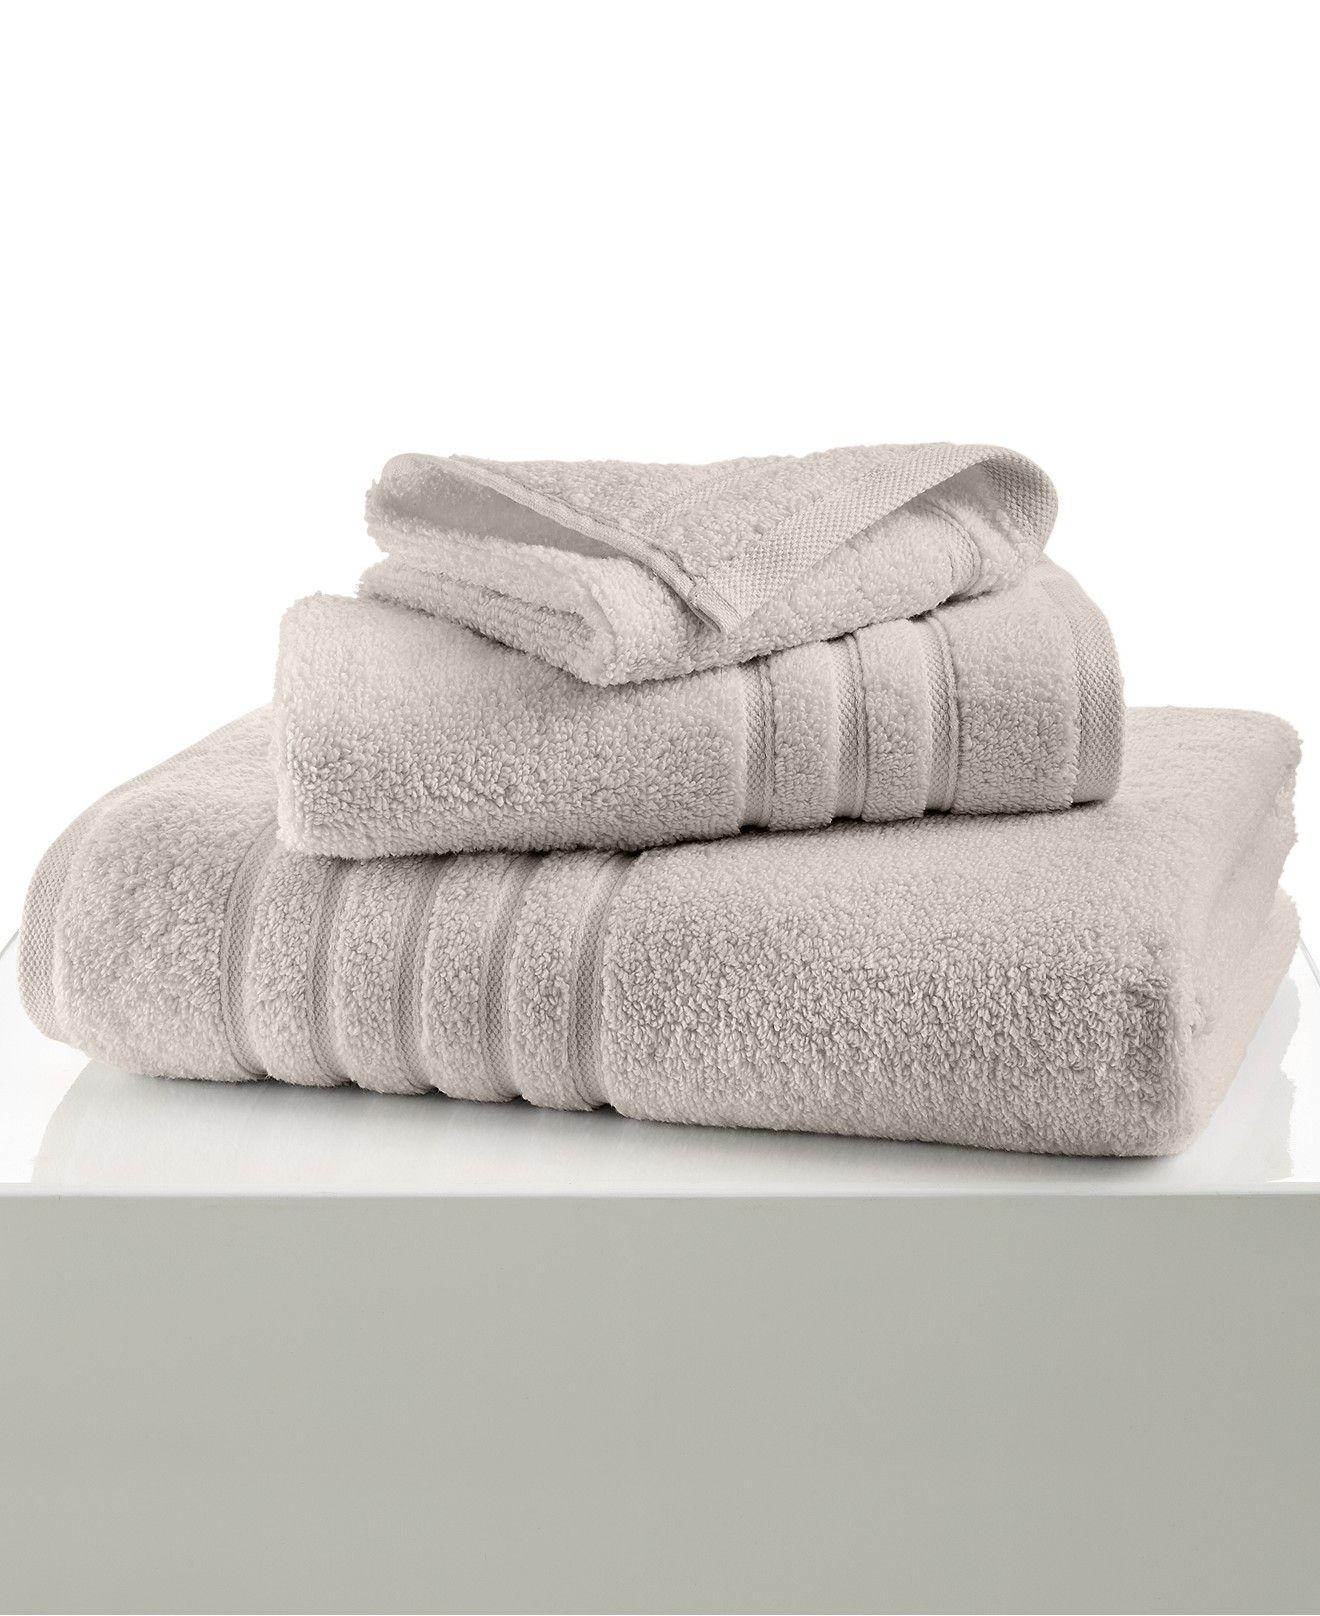 Ultimate Microcotton 30 X 56 Bath Towel Created For Macy S Con